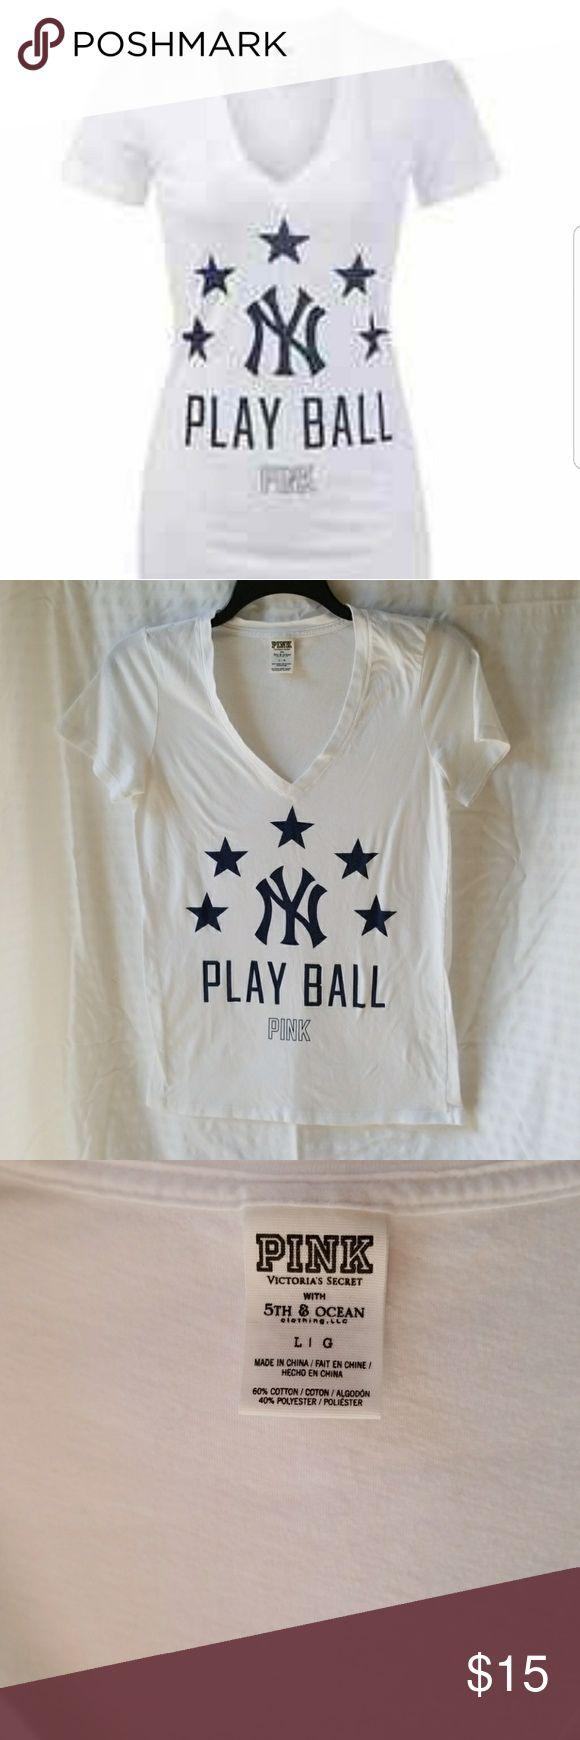 Victoria's Secret Women's New York Yankee's T Victoria's Secret Pink New York Yankee's t-shirt. Size large. EUC. 60% cotton, 40% polyester. Smoke-free home. Victoria's Secret Tops Tees - Short Sleeve